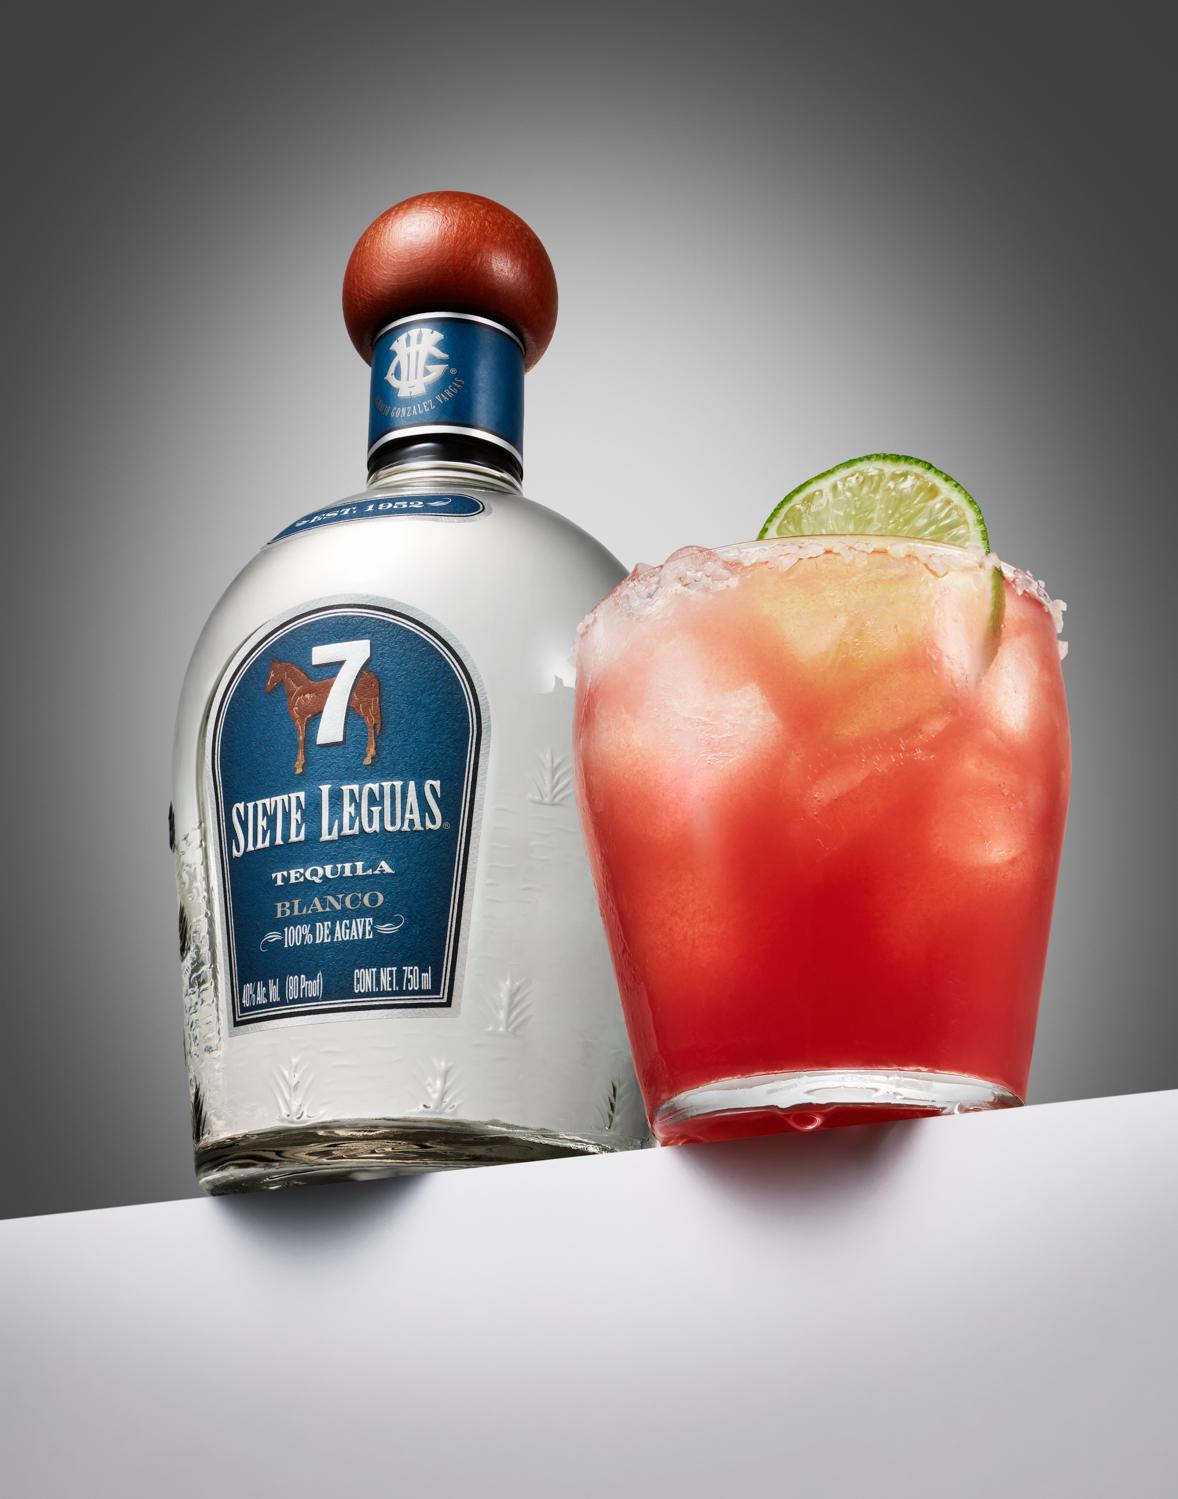 170620 Siete Leguas Tequila.jpg